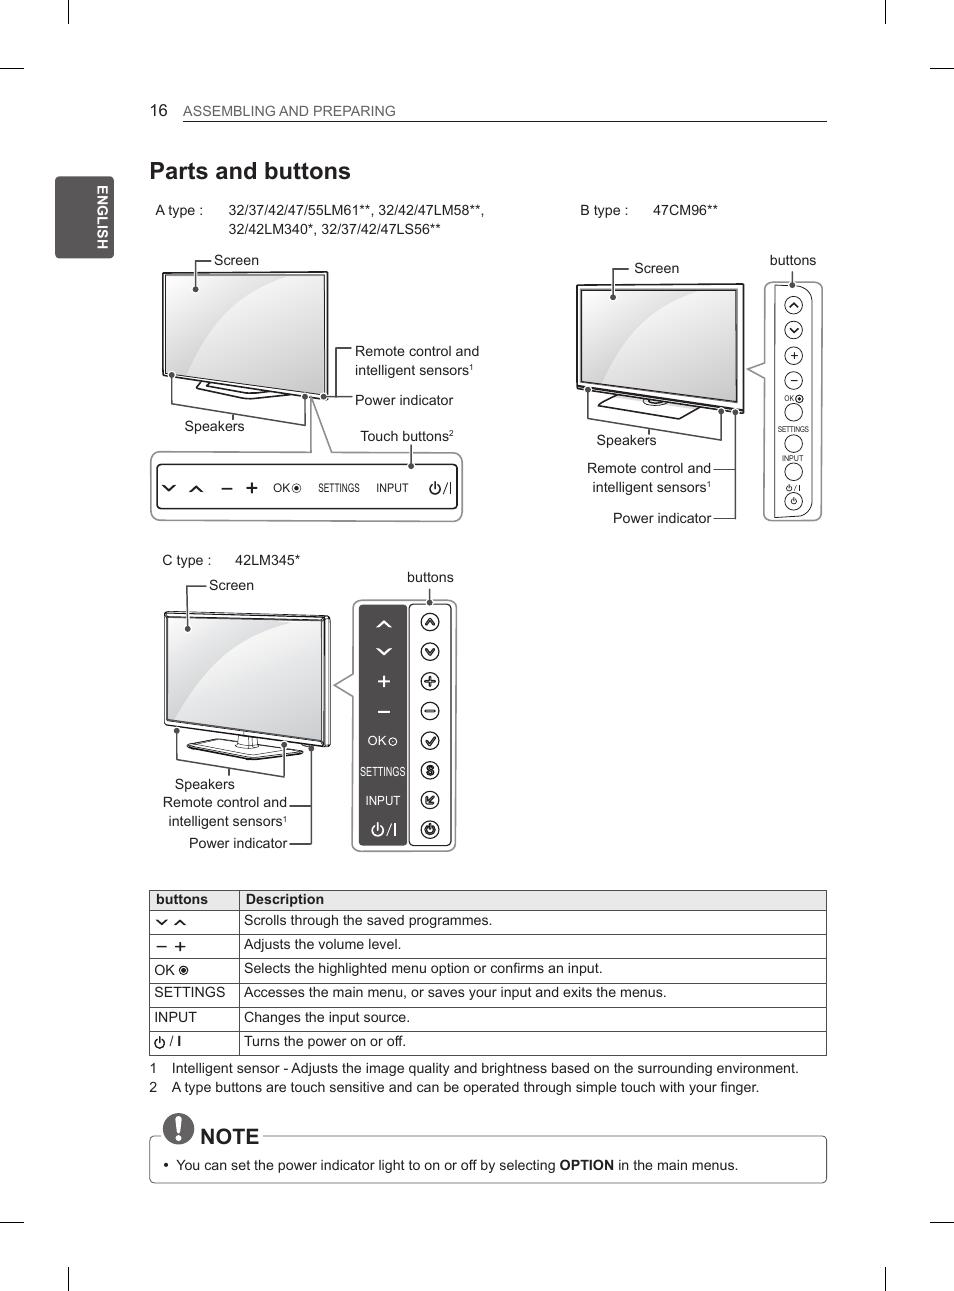 Инструкция по эксплуатации lg 32lm3400